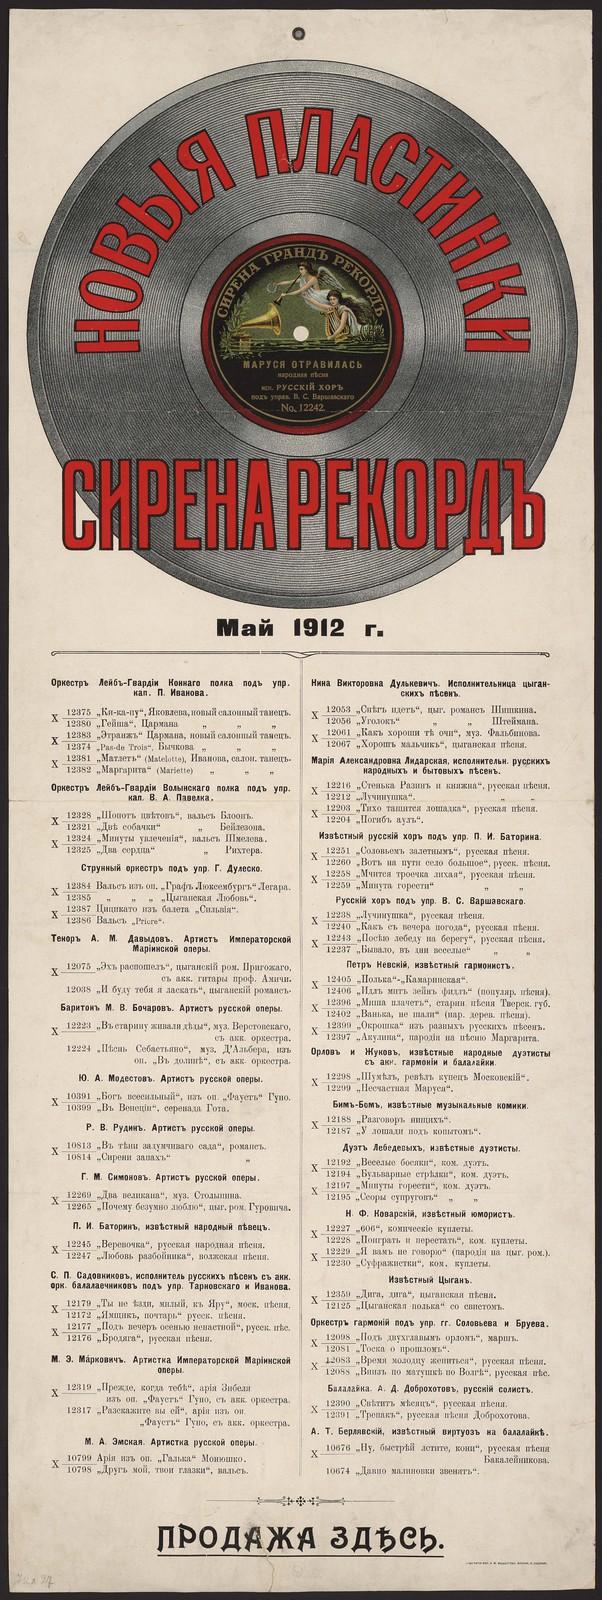 01. Новые пластинки Сирена рекорд Май 1912